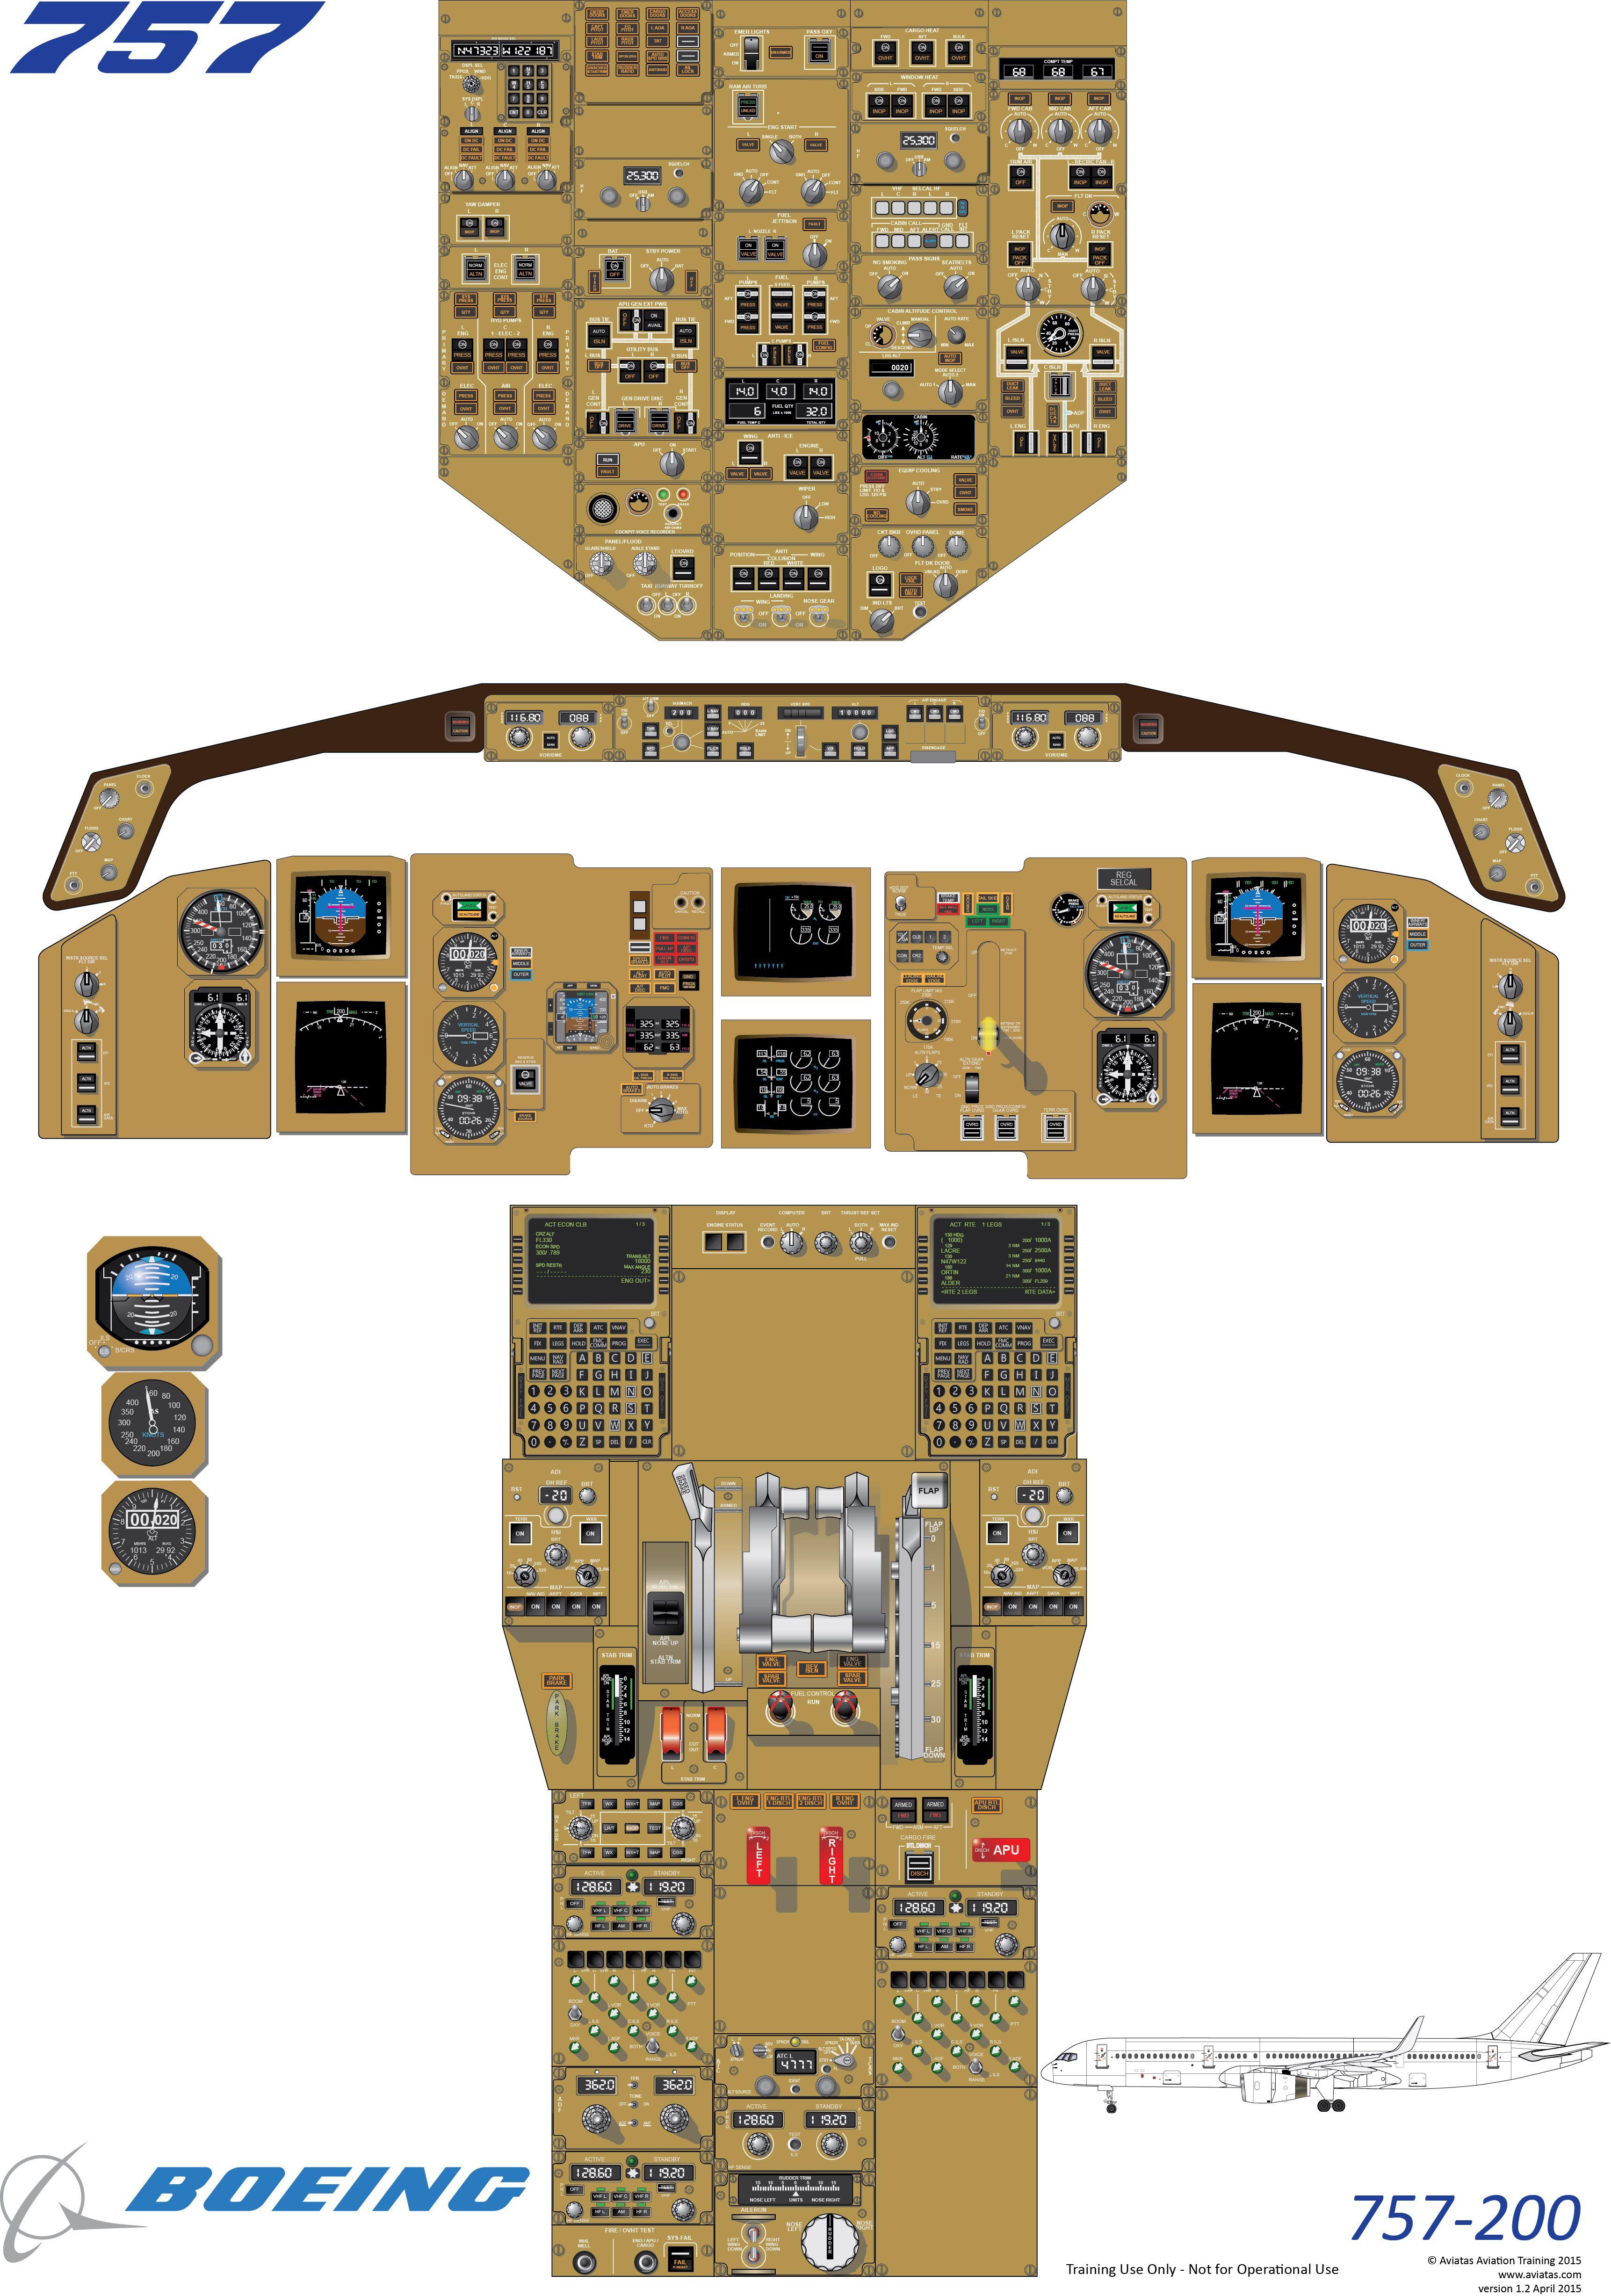 Boeing 757 200 Cockpit Training Diagram Used For Training Pilots